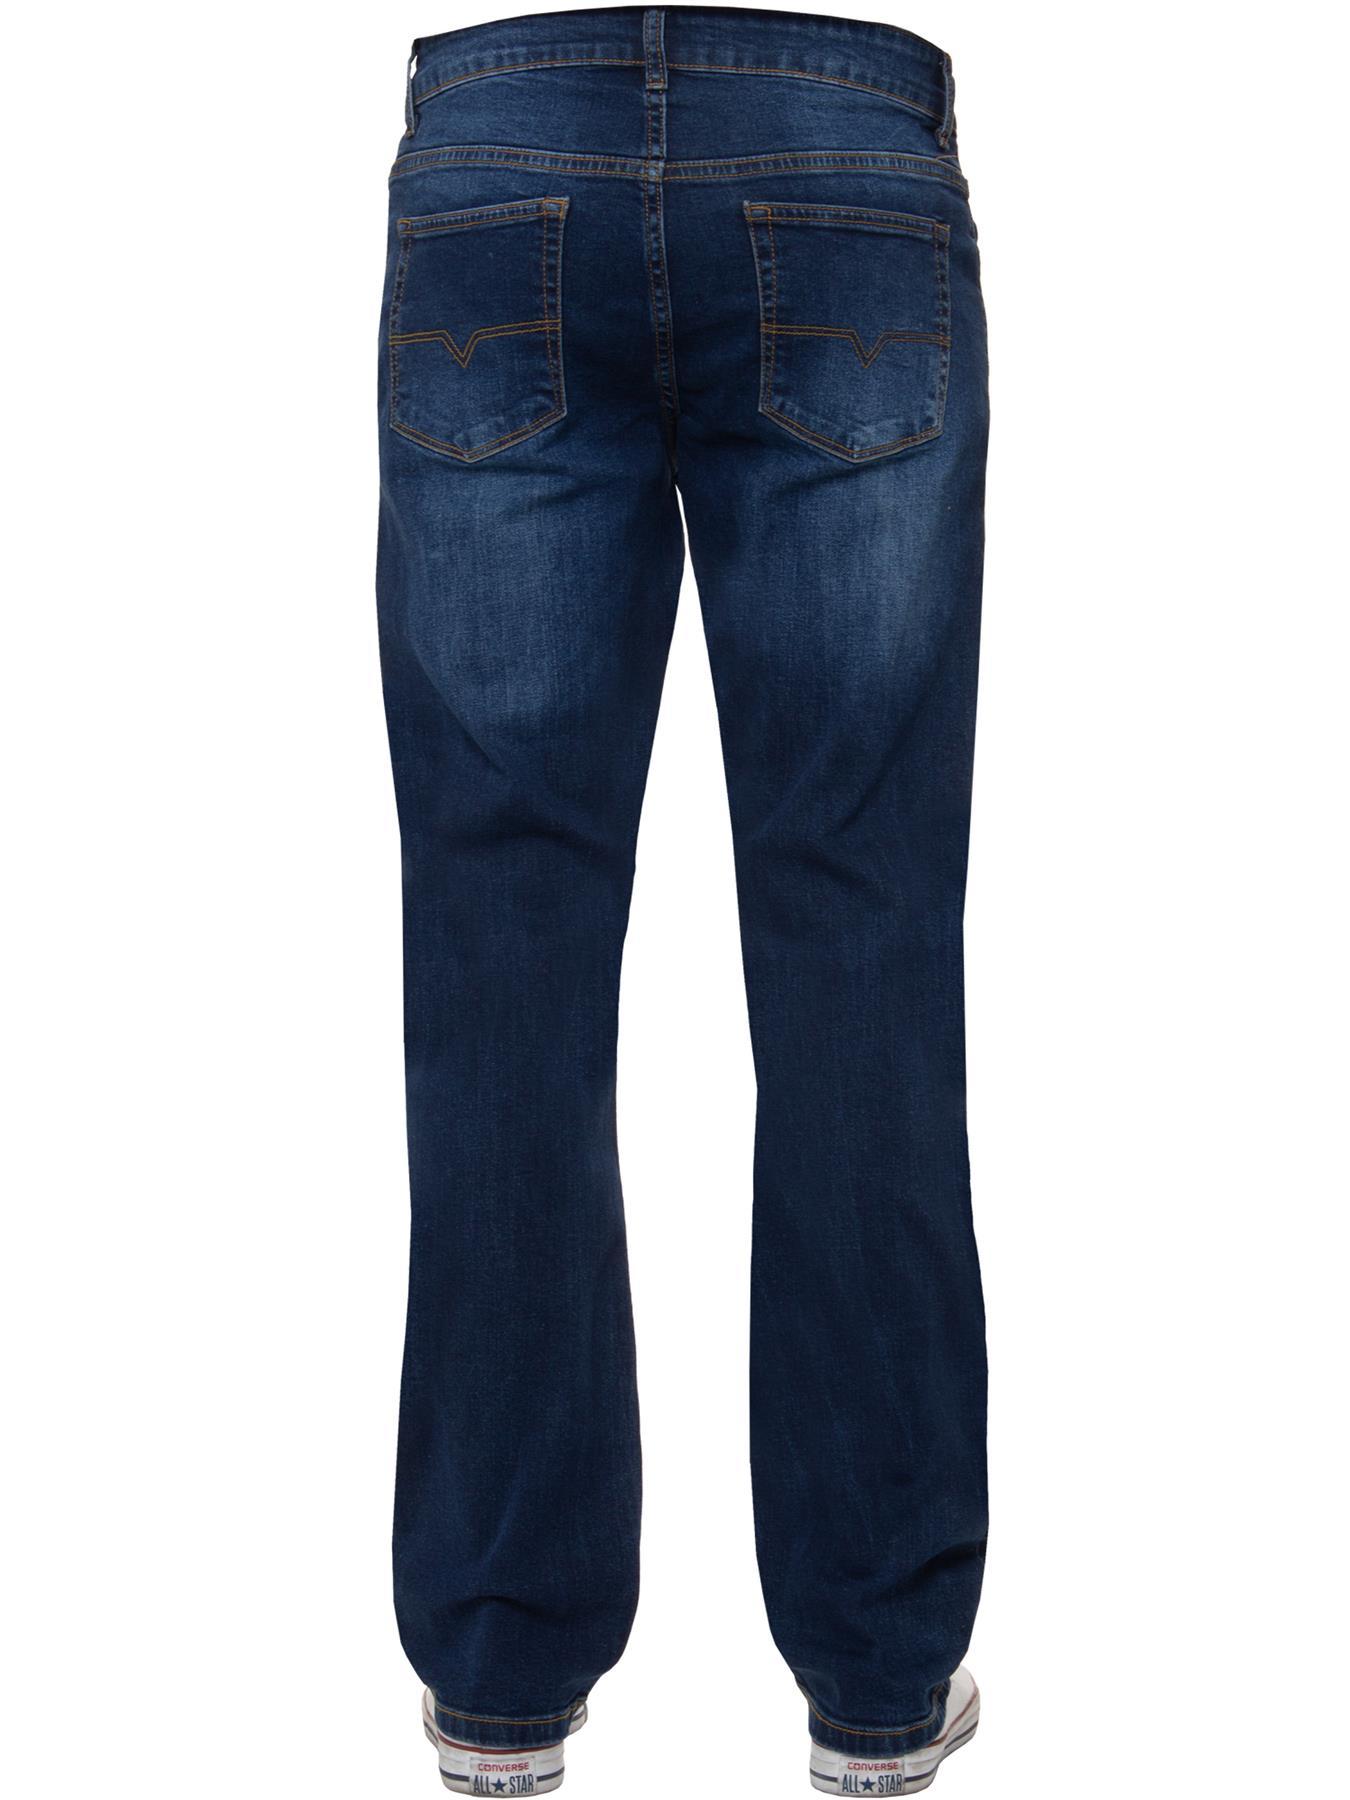 Para-Hombre-Pierna-Recta-Bootcut-Stretch-Denim-Regulares-Pantalon-de-trabajo-Kruze-Todas-Cinturas miniatura 46